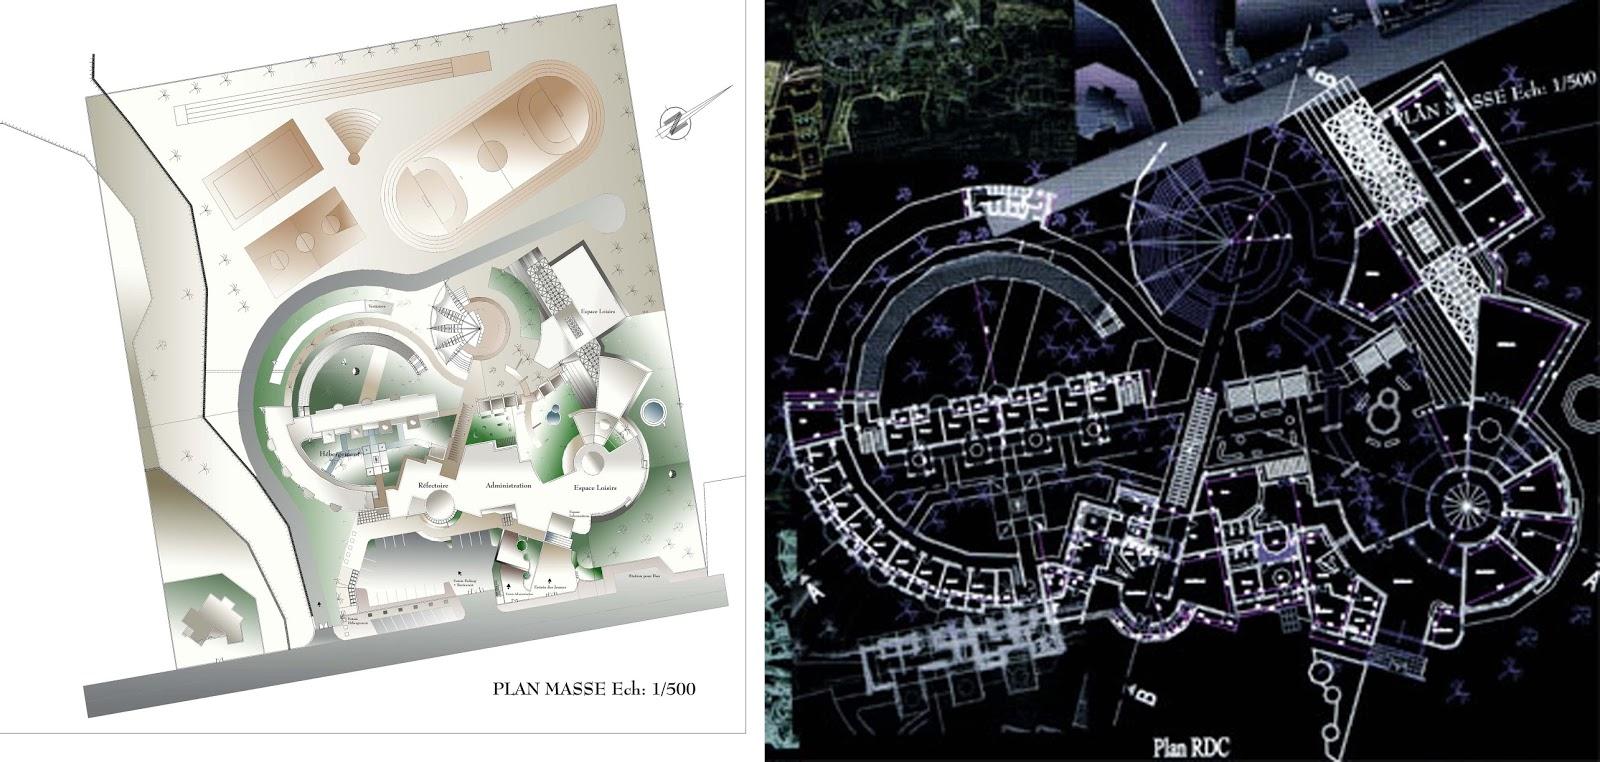 workshop complexe de jeunes 2004. Black Bedroom Furniture Sets. Home Design Ideas